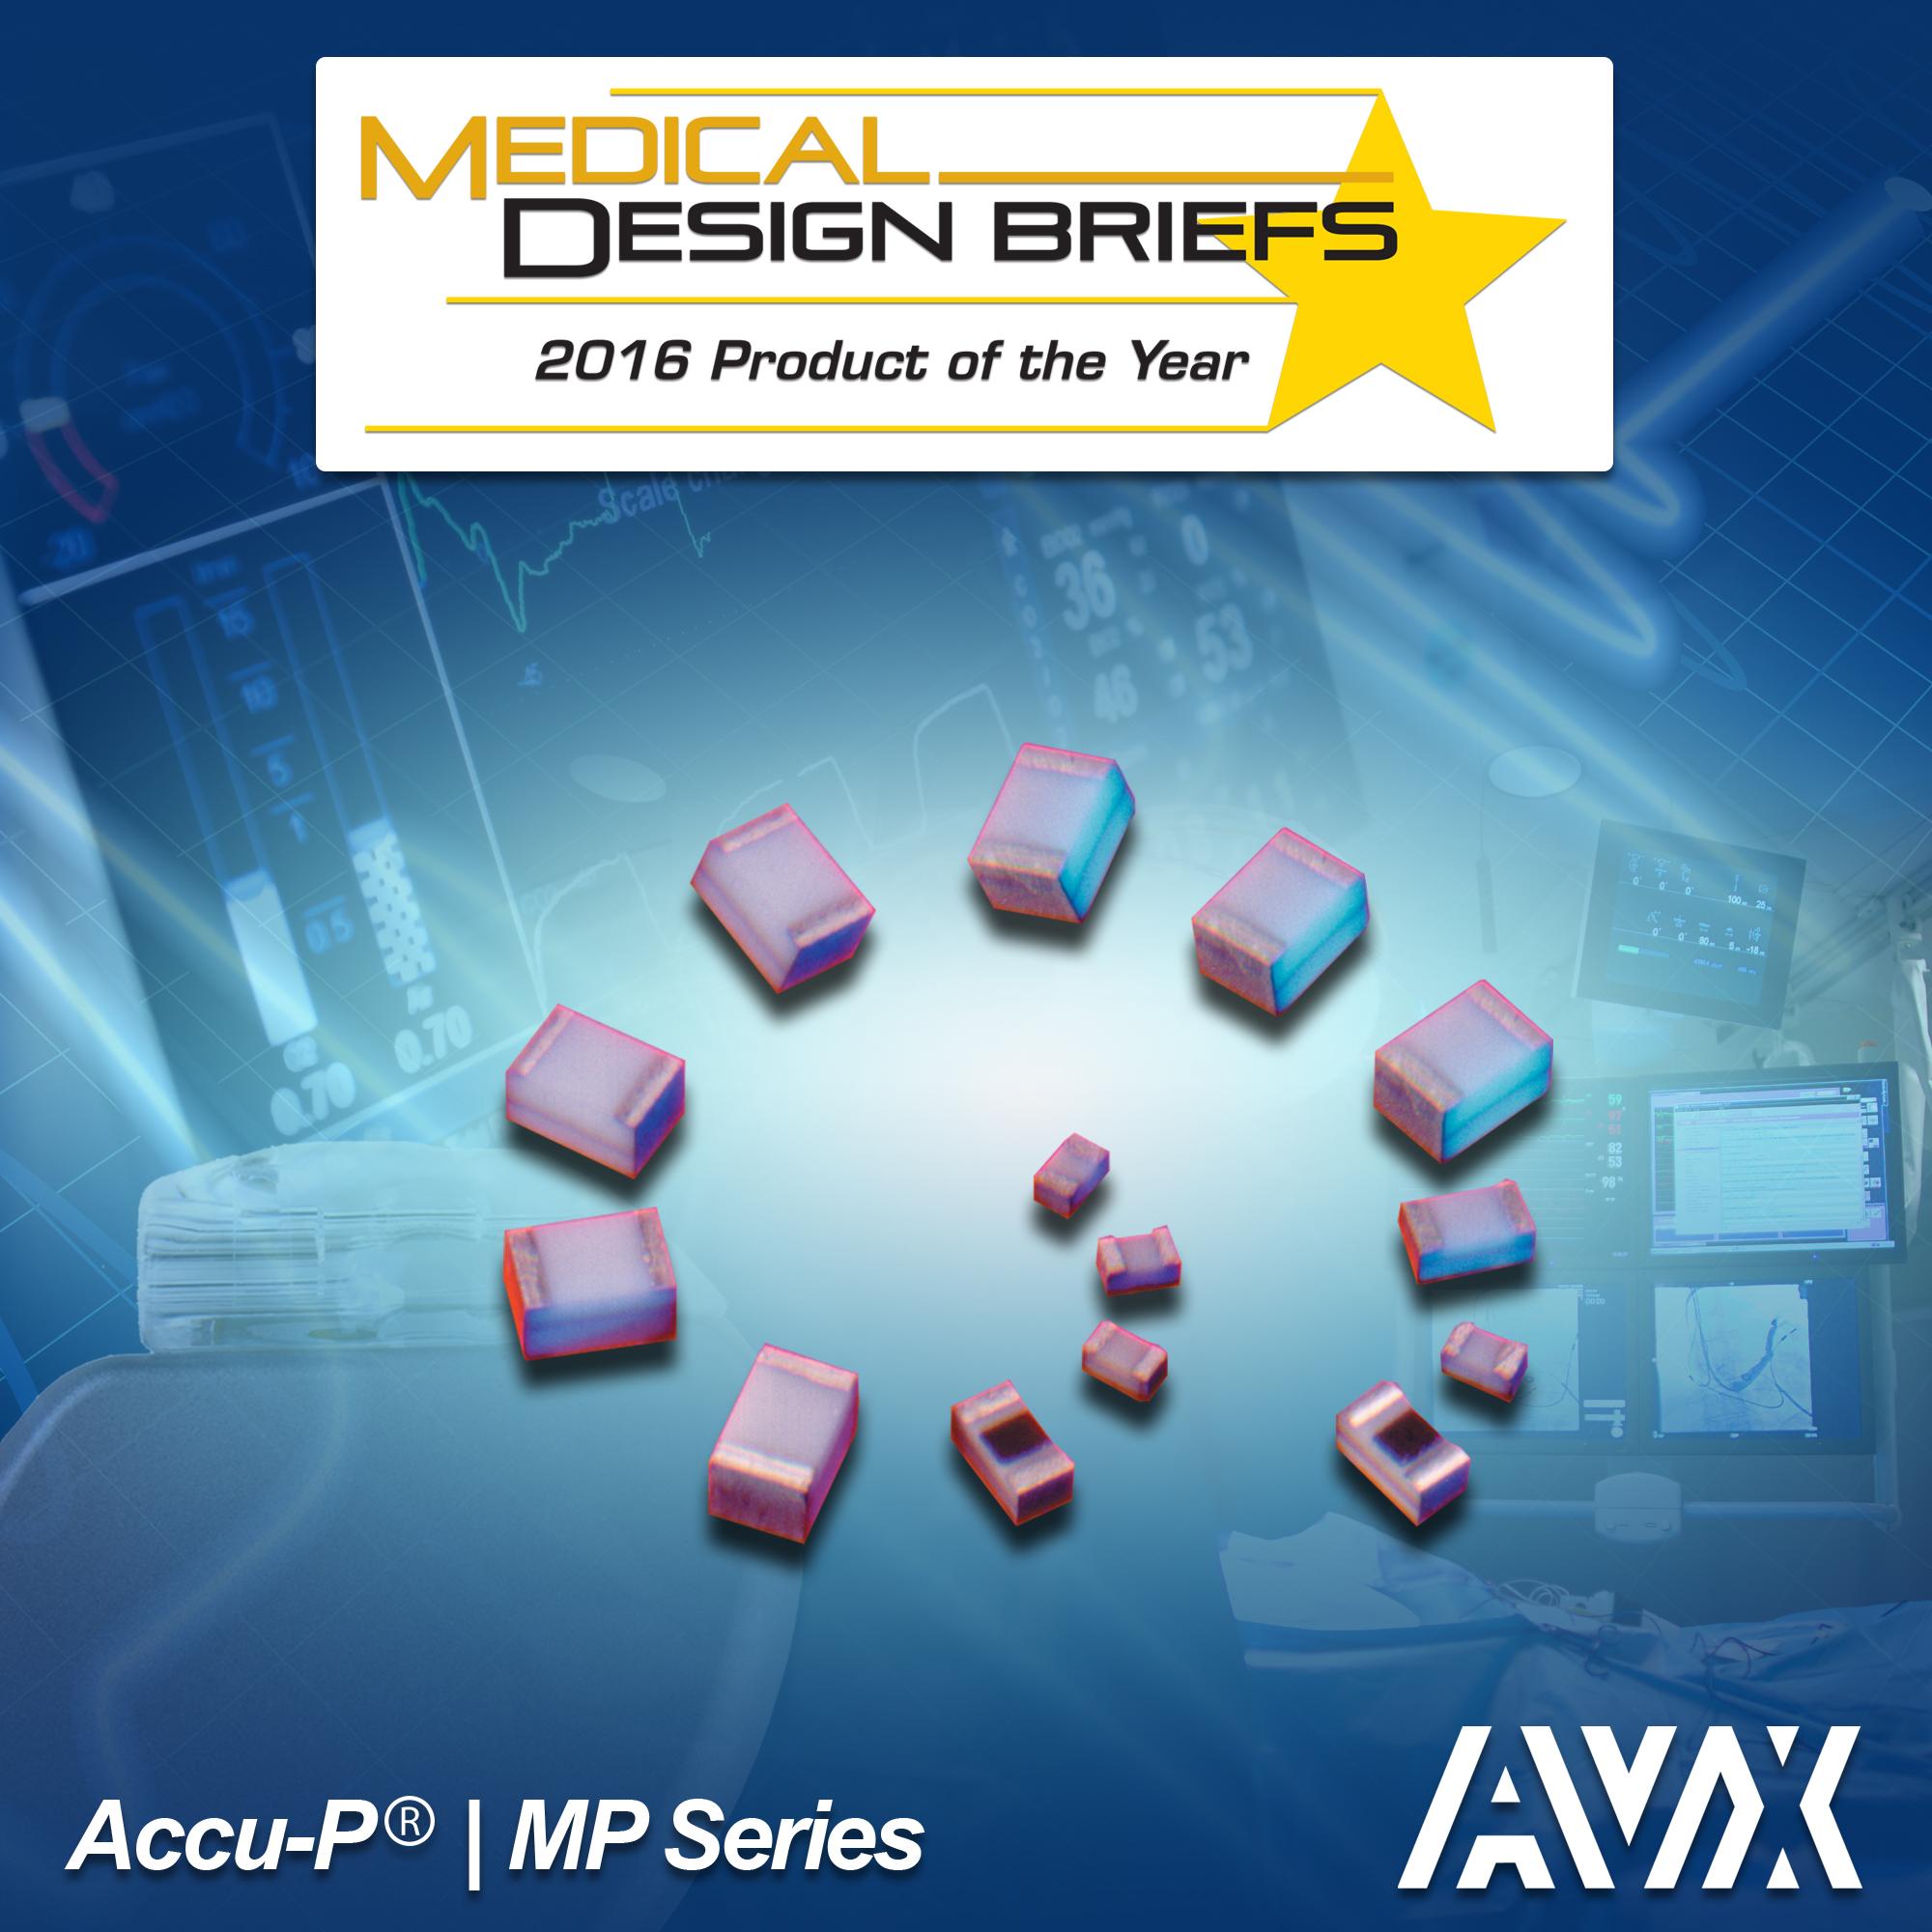 Avx Wins Medical Design Briefs 2016 Readers Choice